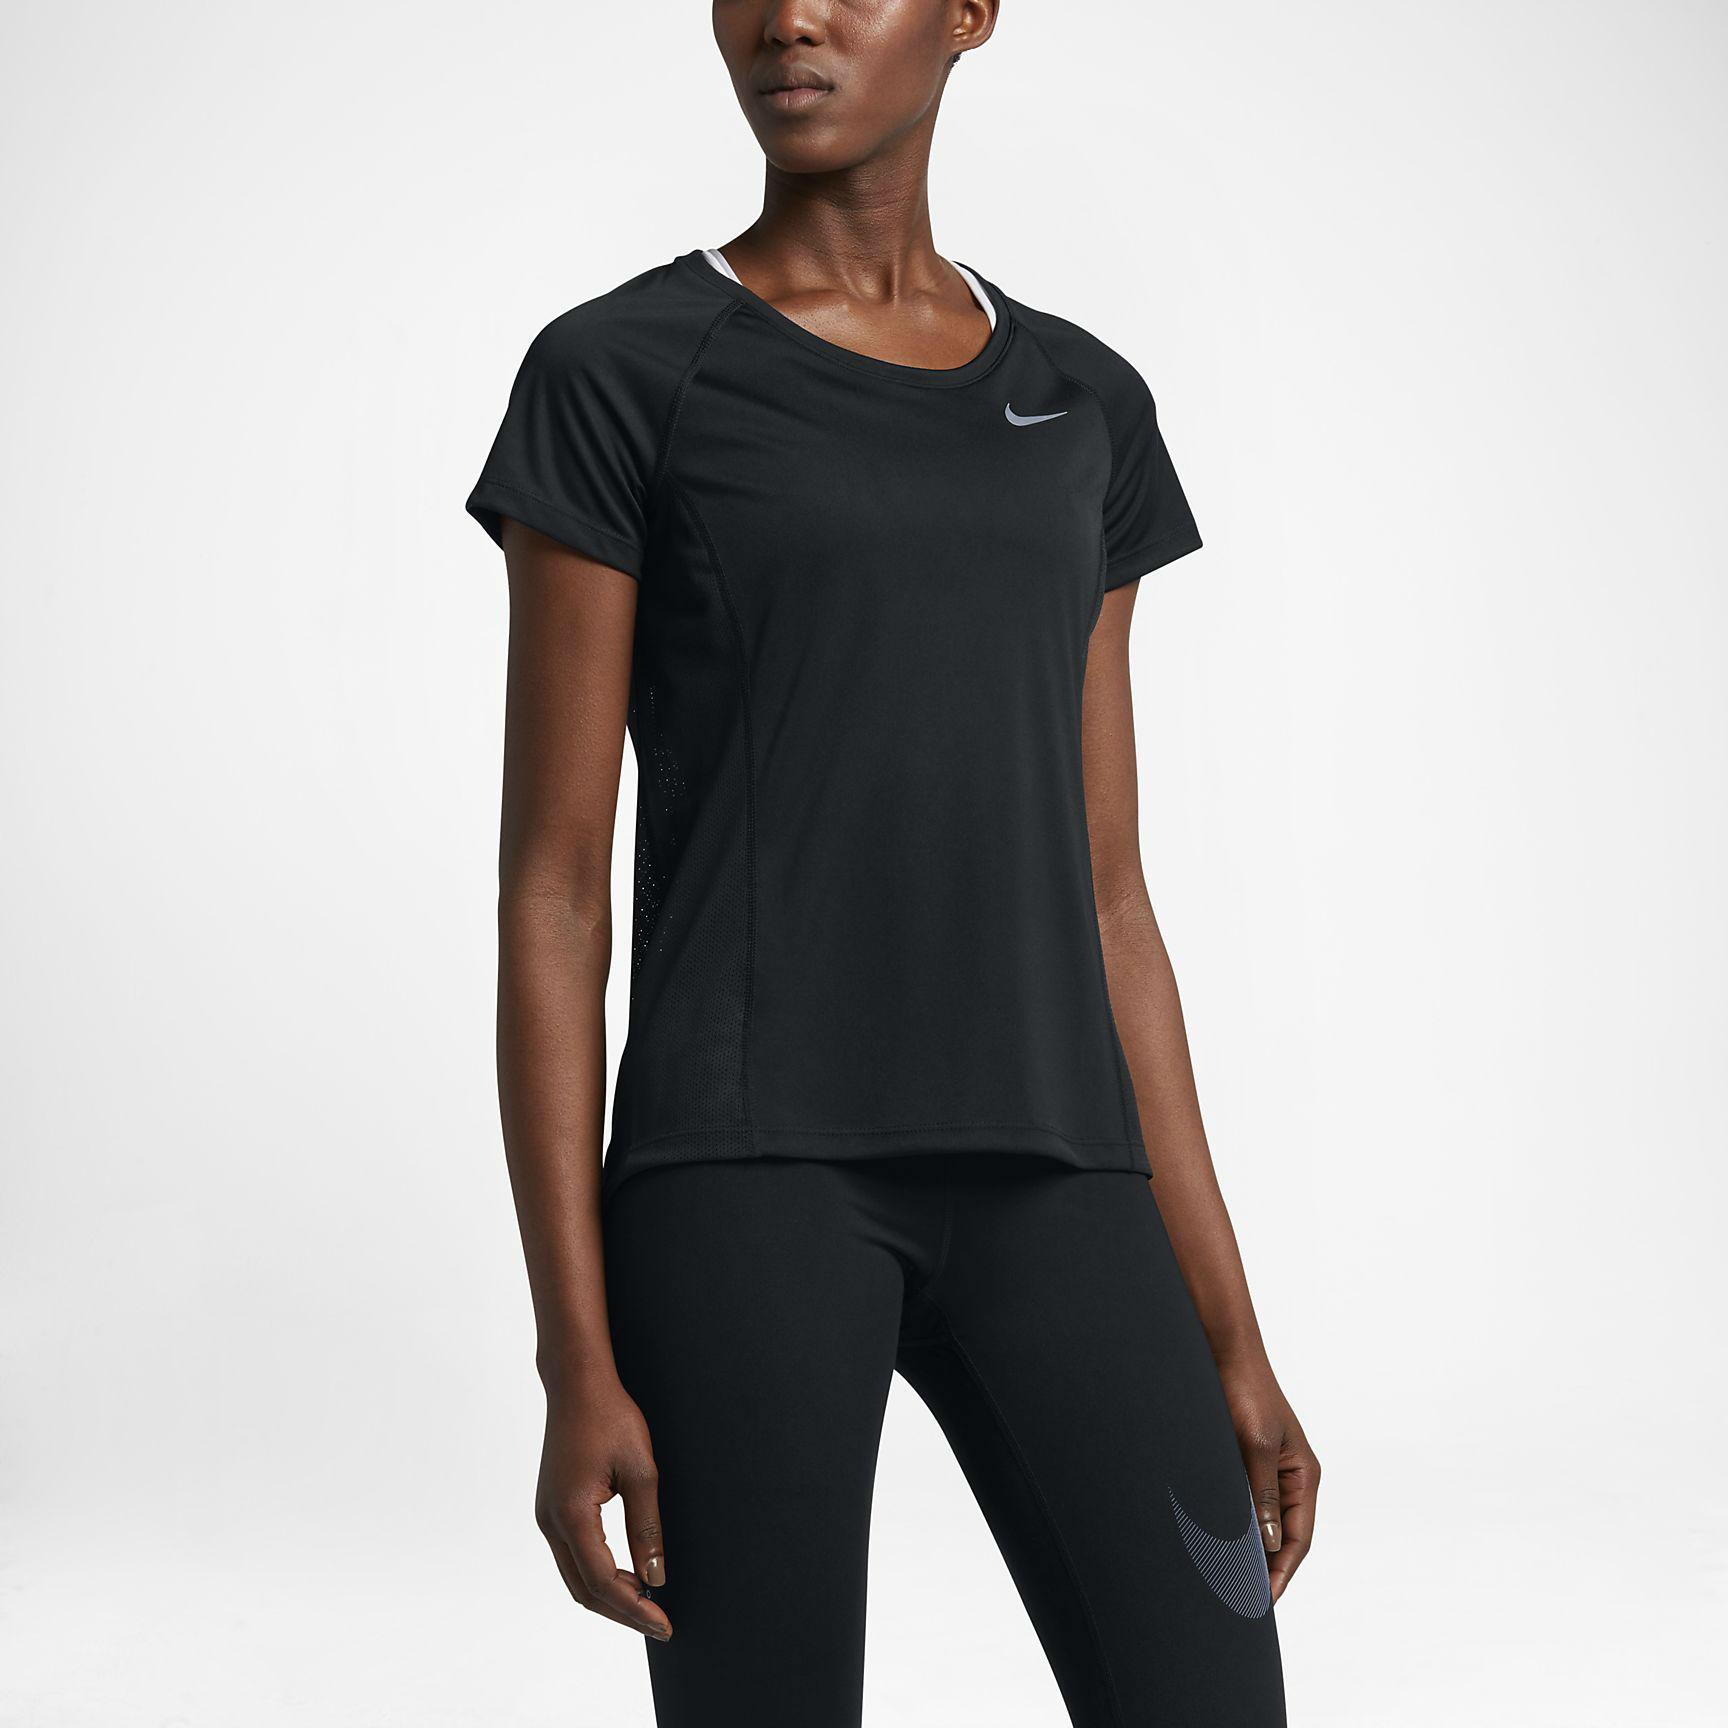 NikeNike Miller Women's Short Sleeve Running Top